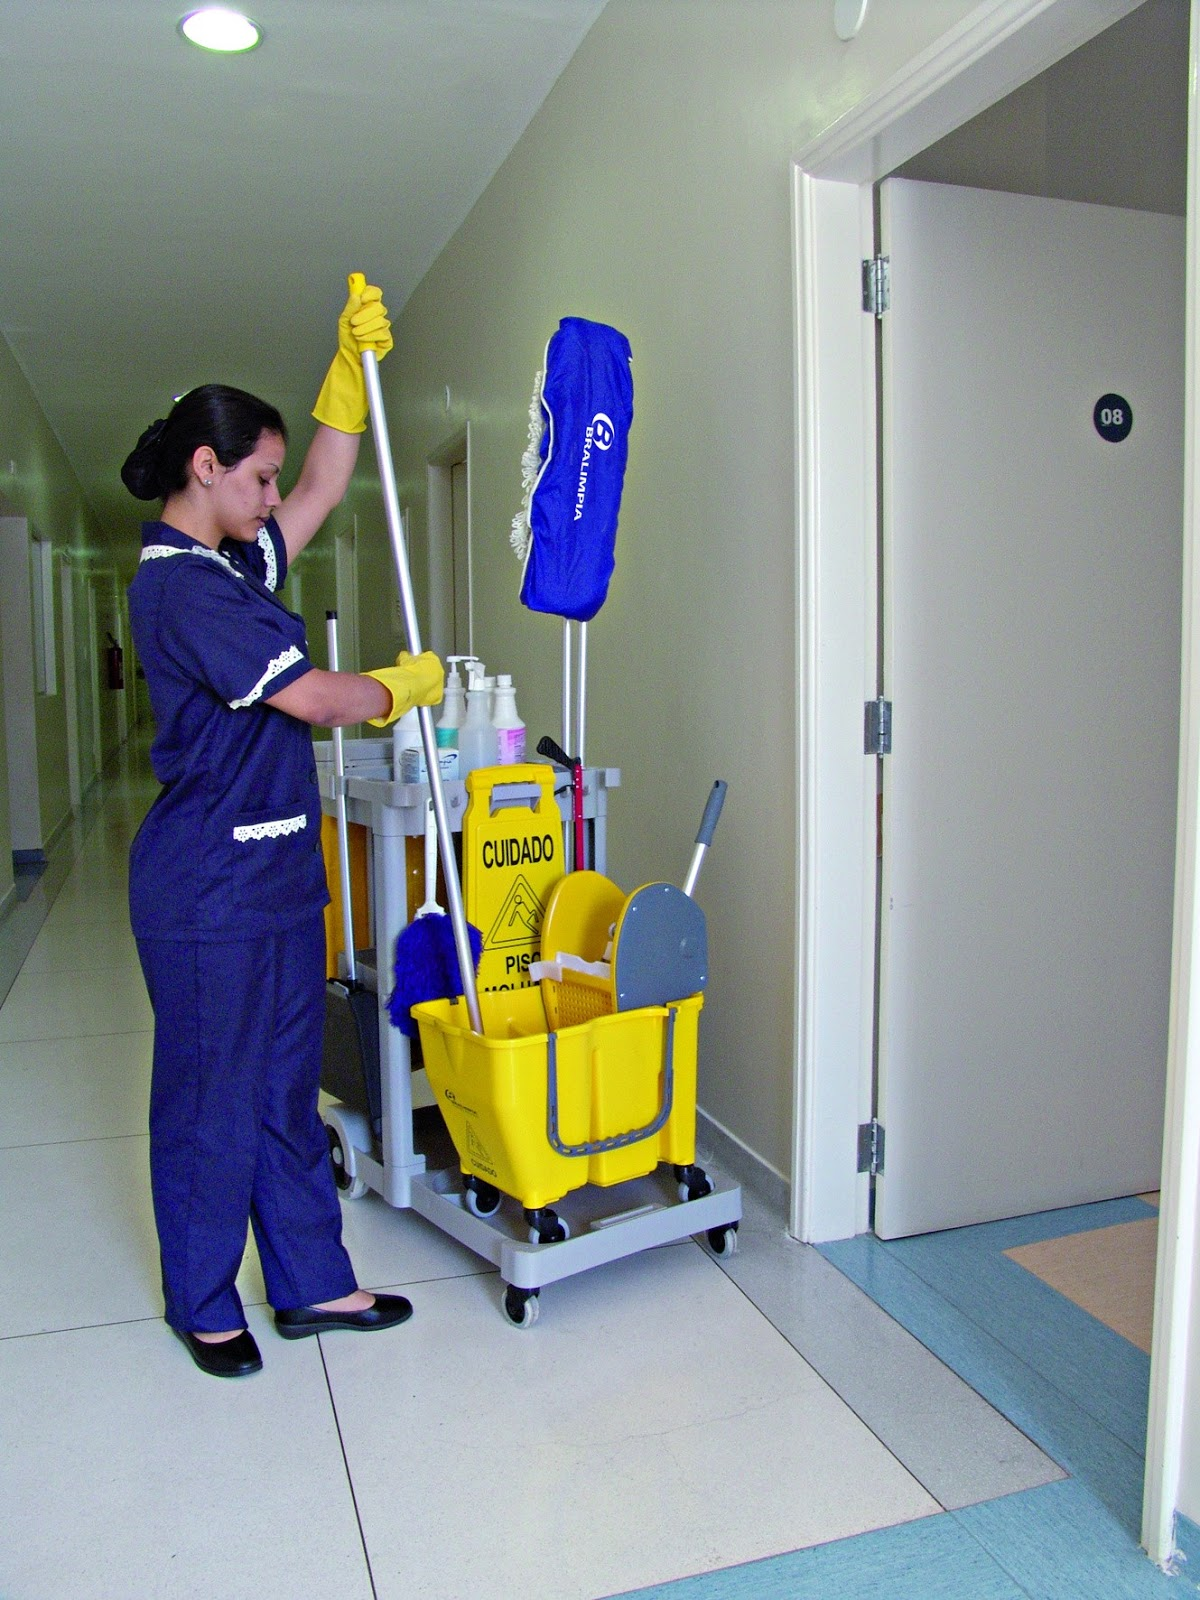 Limpeza Banheiro Hospitalar : Limpeza hospitalar vaneli e servi?os